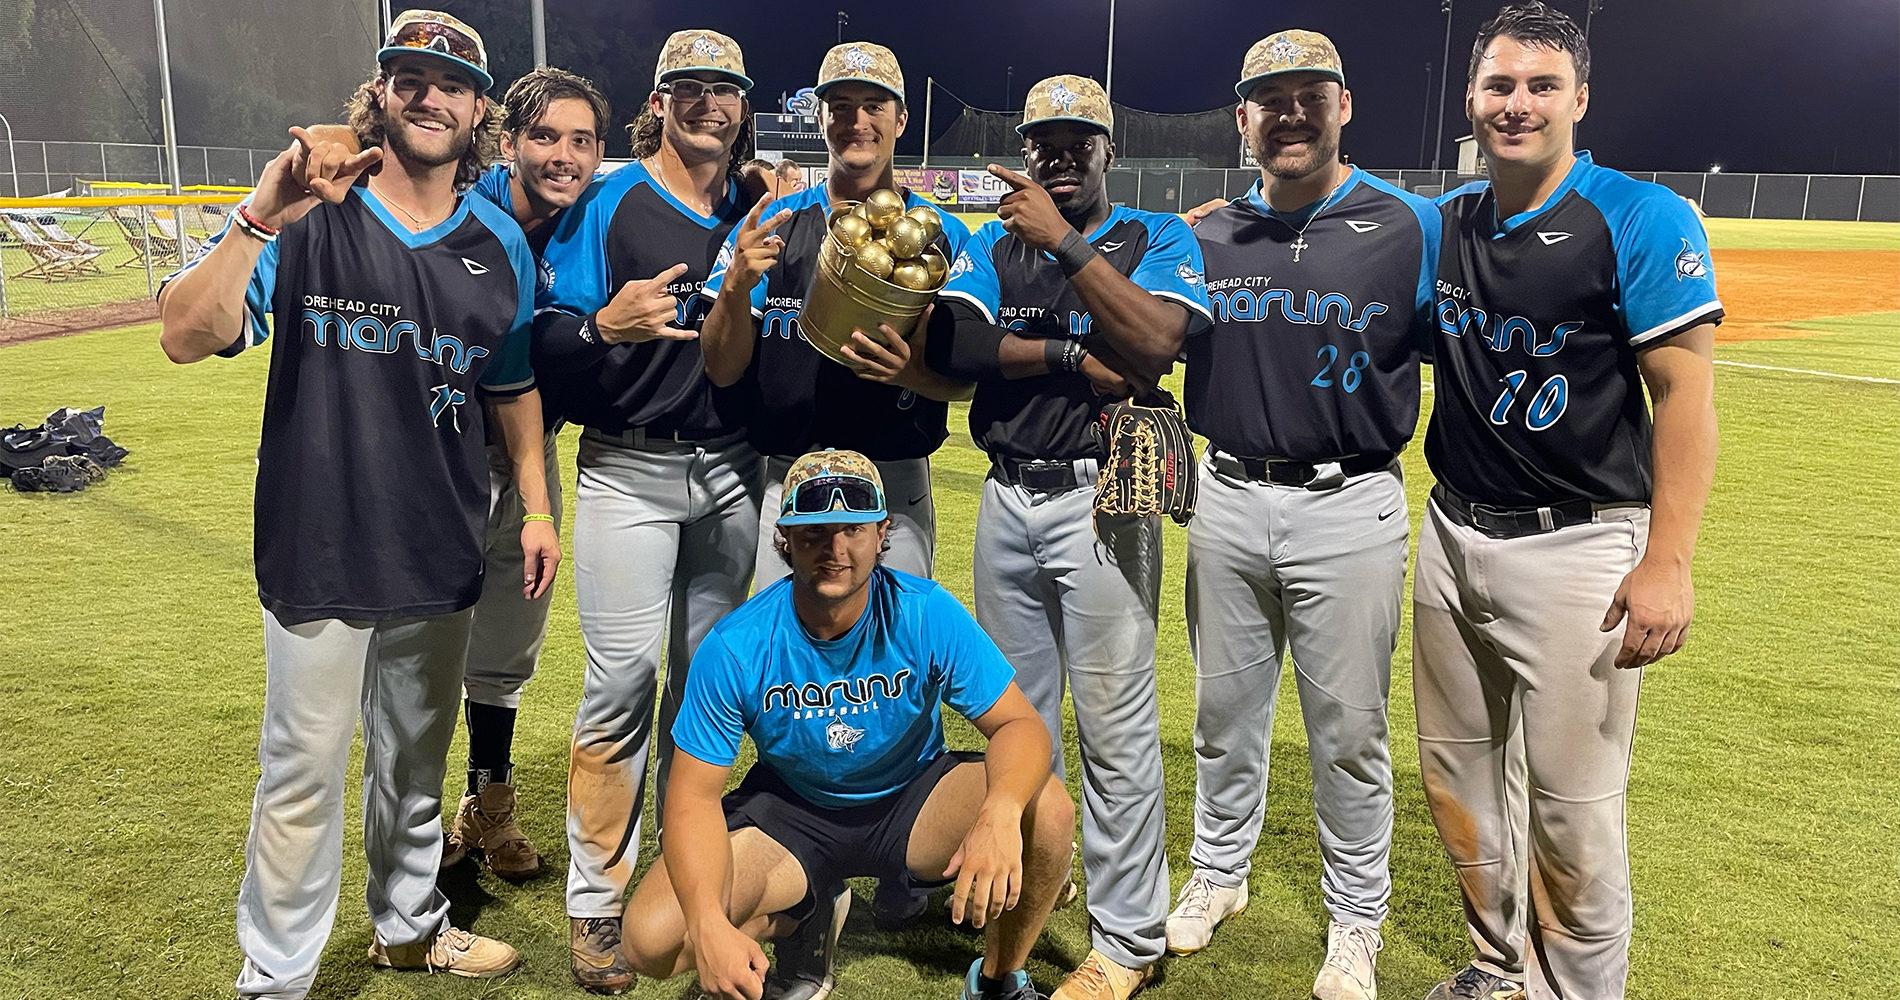 Marlins Crush Sharks, Win Inaugural Golden Chumbucket Series